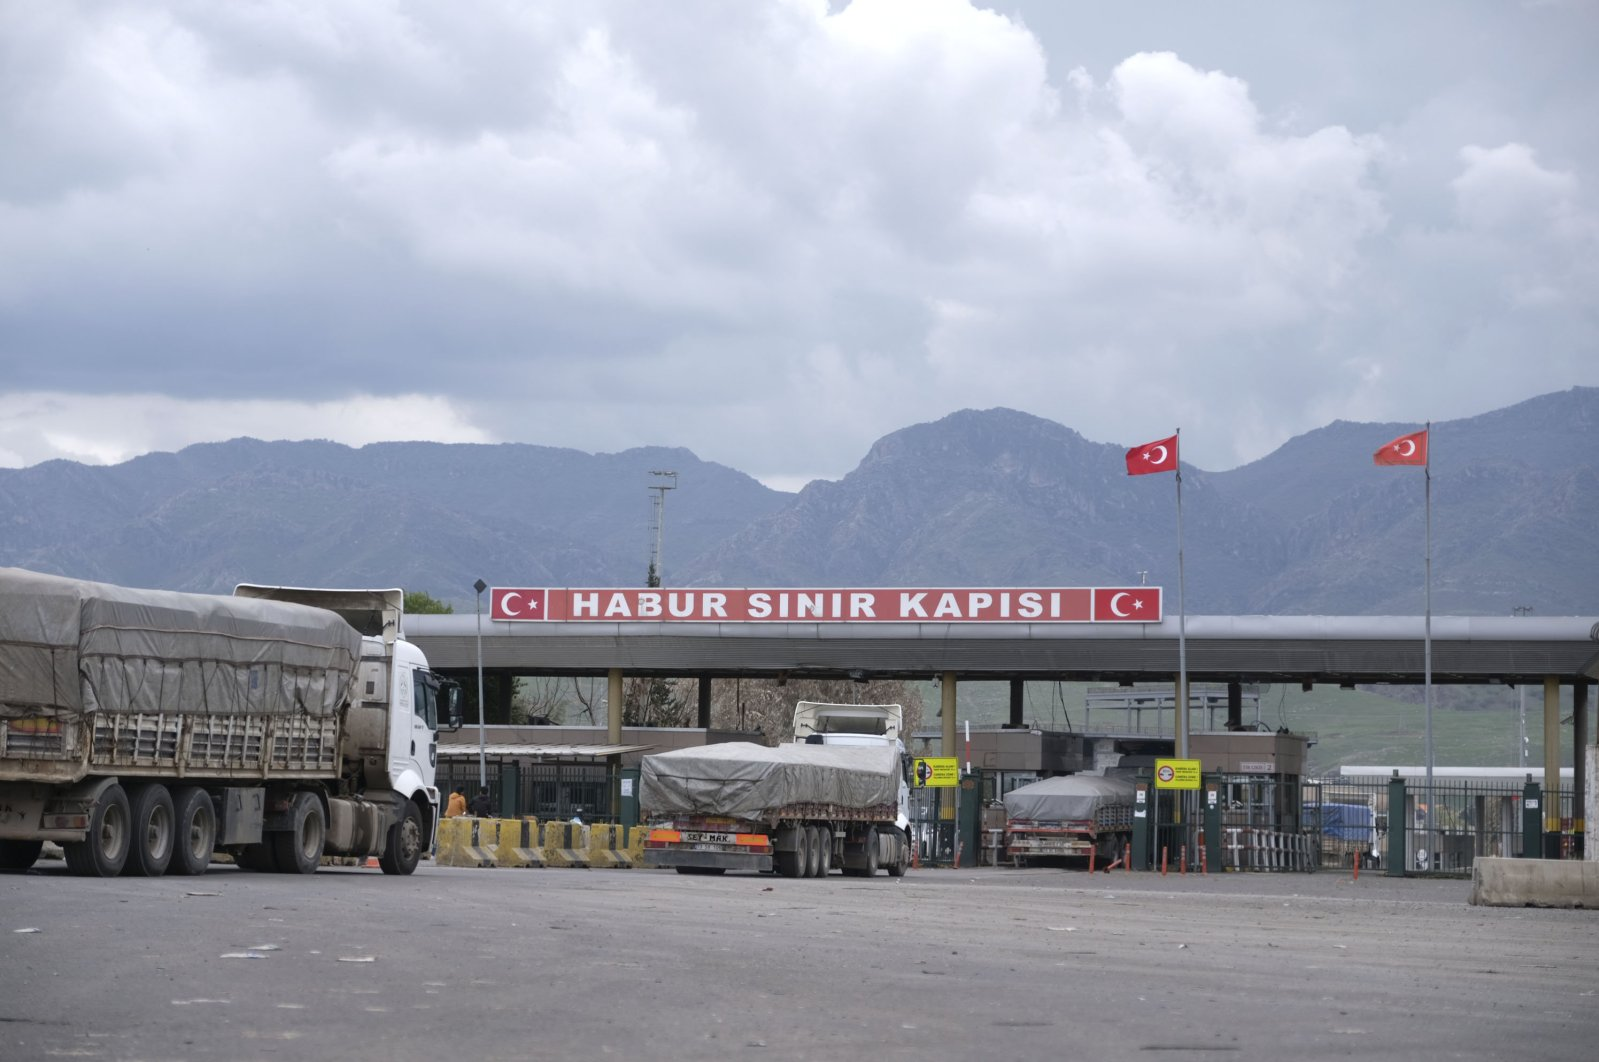 Trucks are seen at the Habur border gate in Turkey's southeastern Şırnak province bordering Iraq, April 5, 2020.